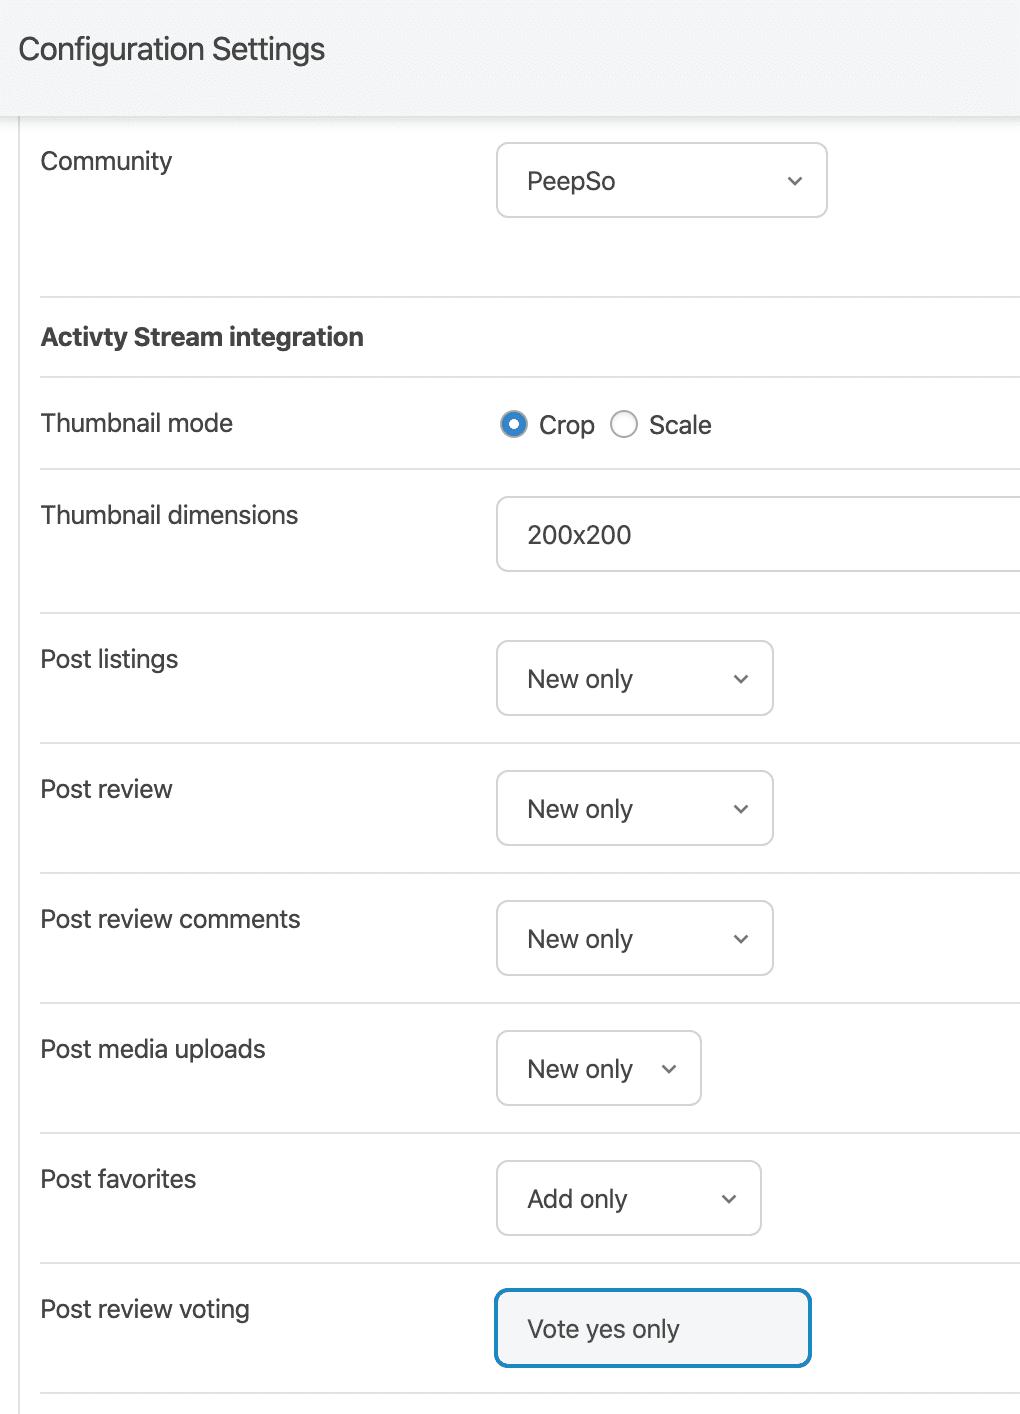 PeepSo activity stream options